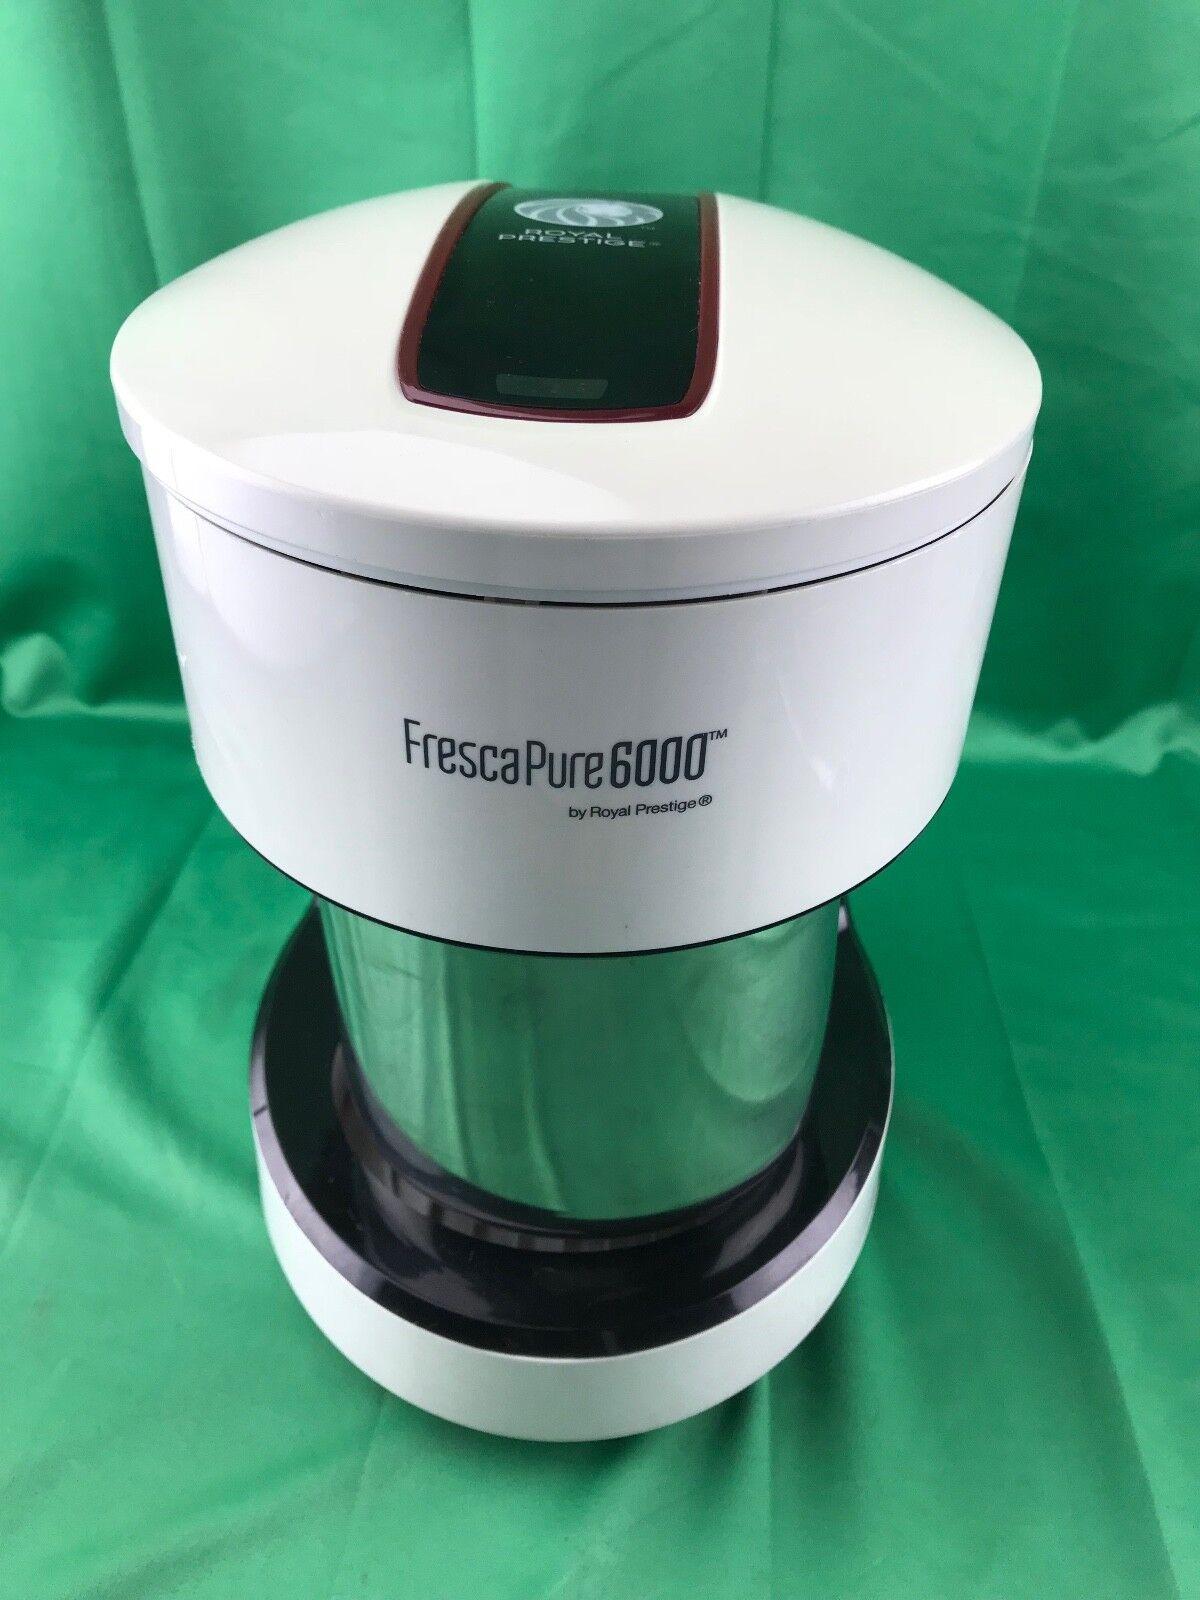 A Royal Prestige Filtre (frescapure 6000)